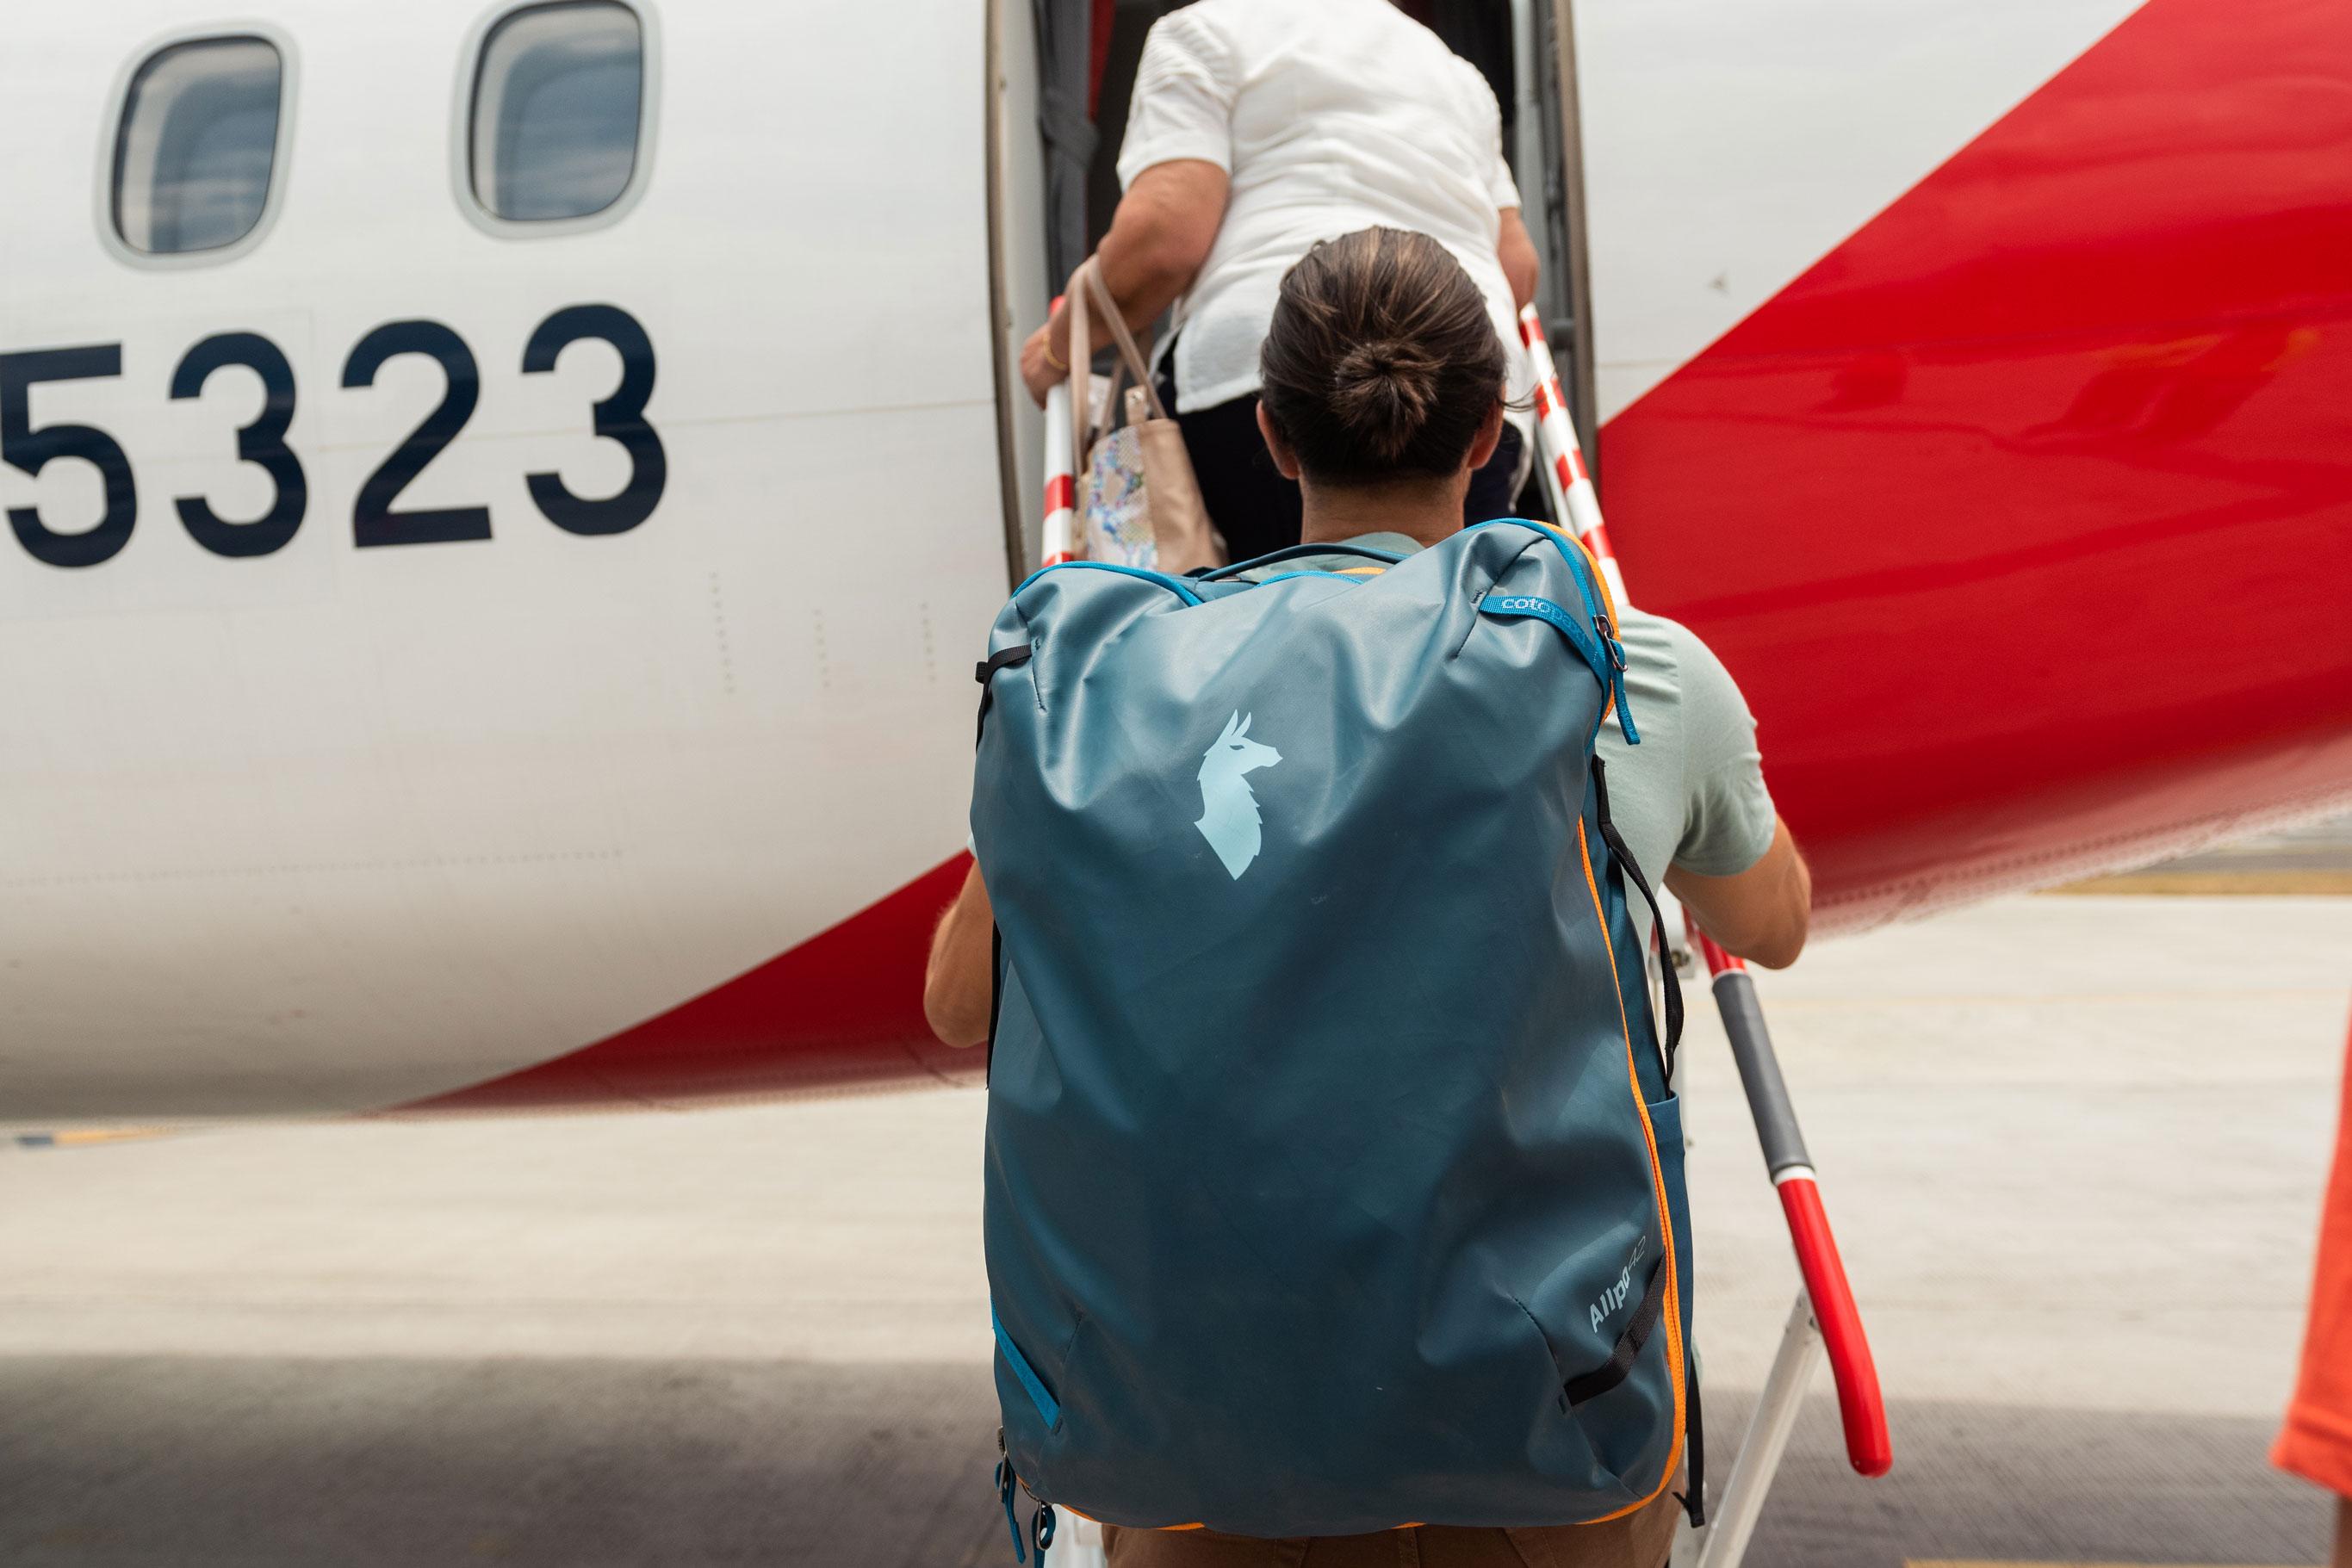 Cotopaxi Allpa 42 boarding plane travel luggage